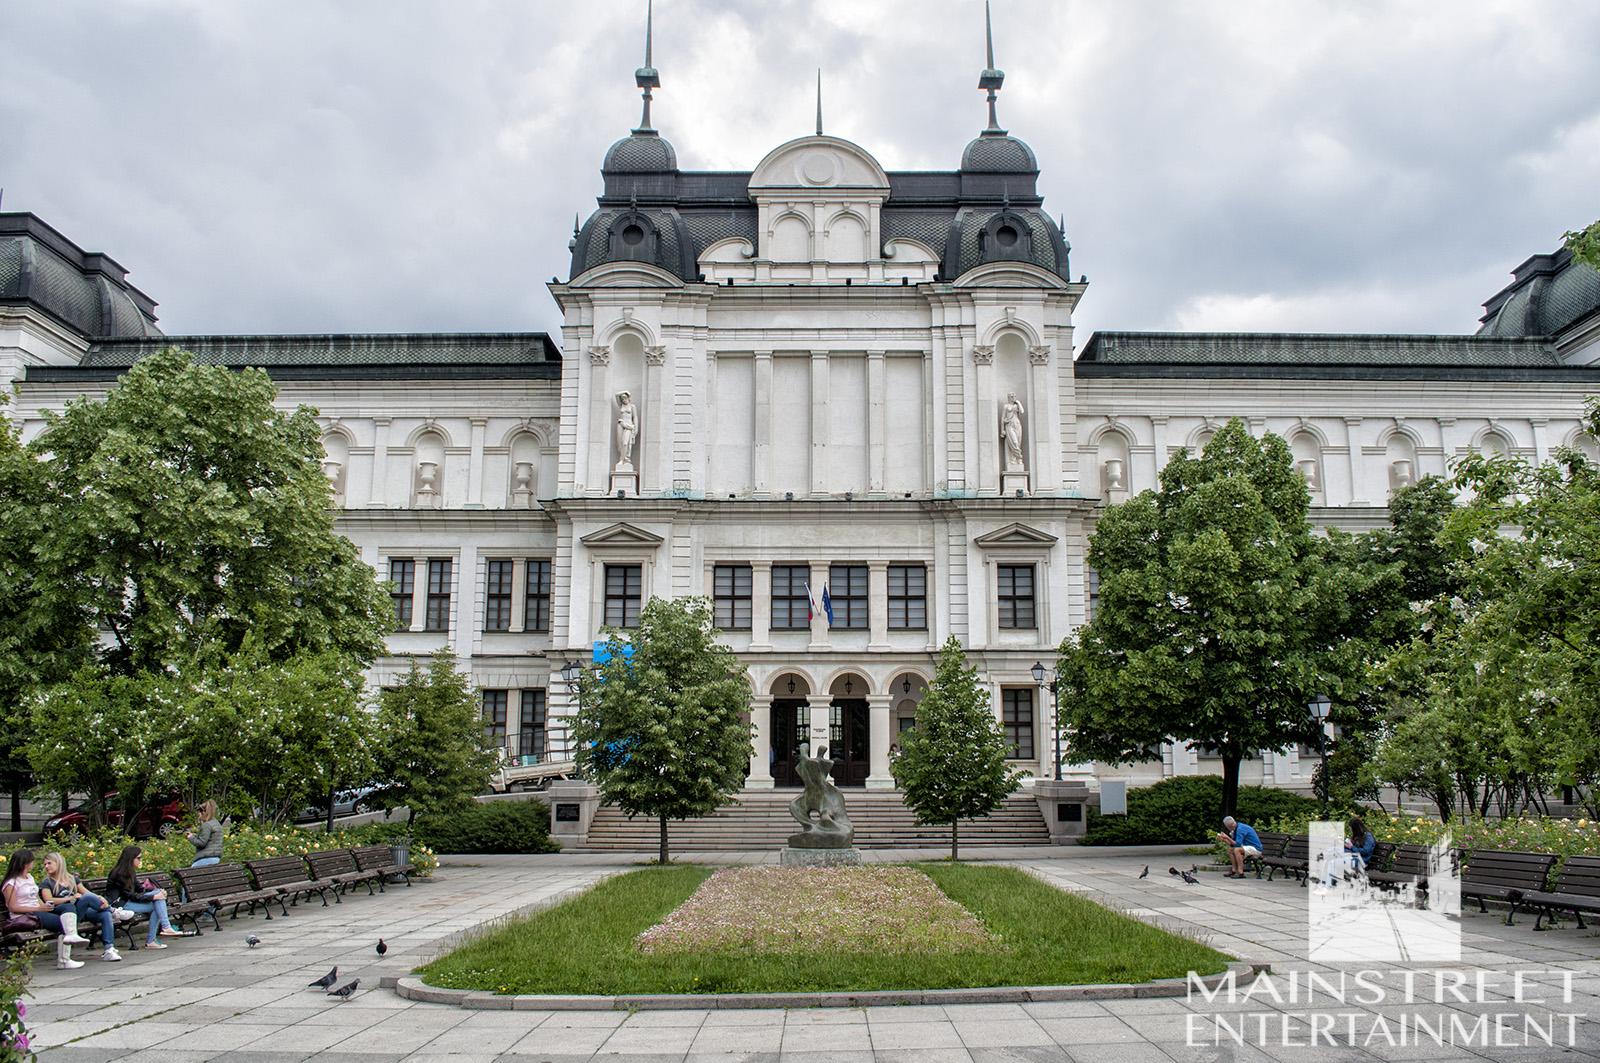 europe period art gallery museum location